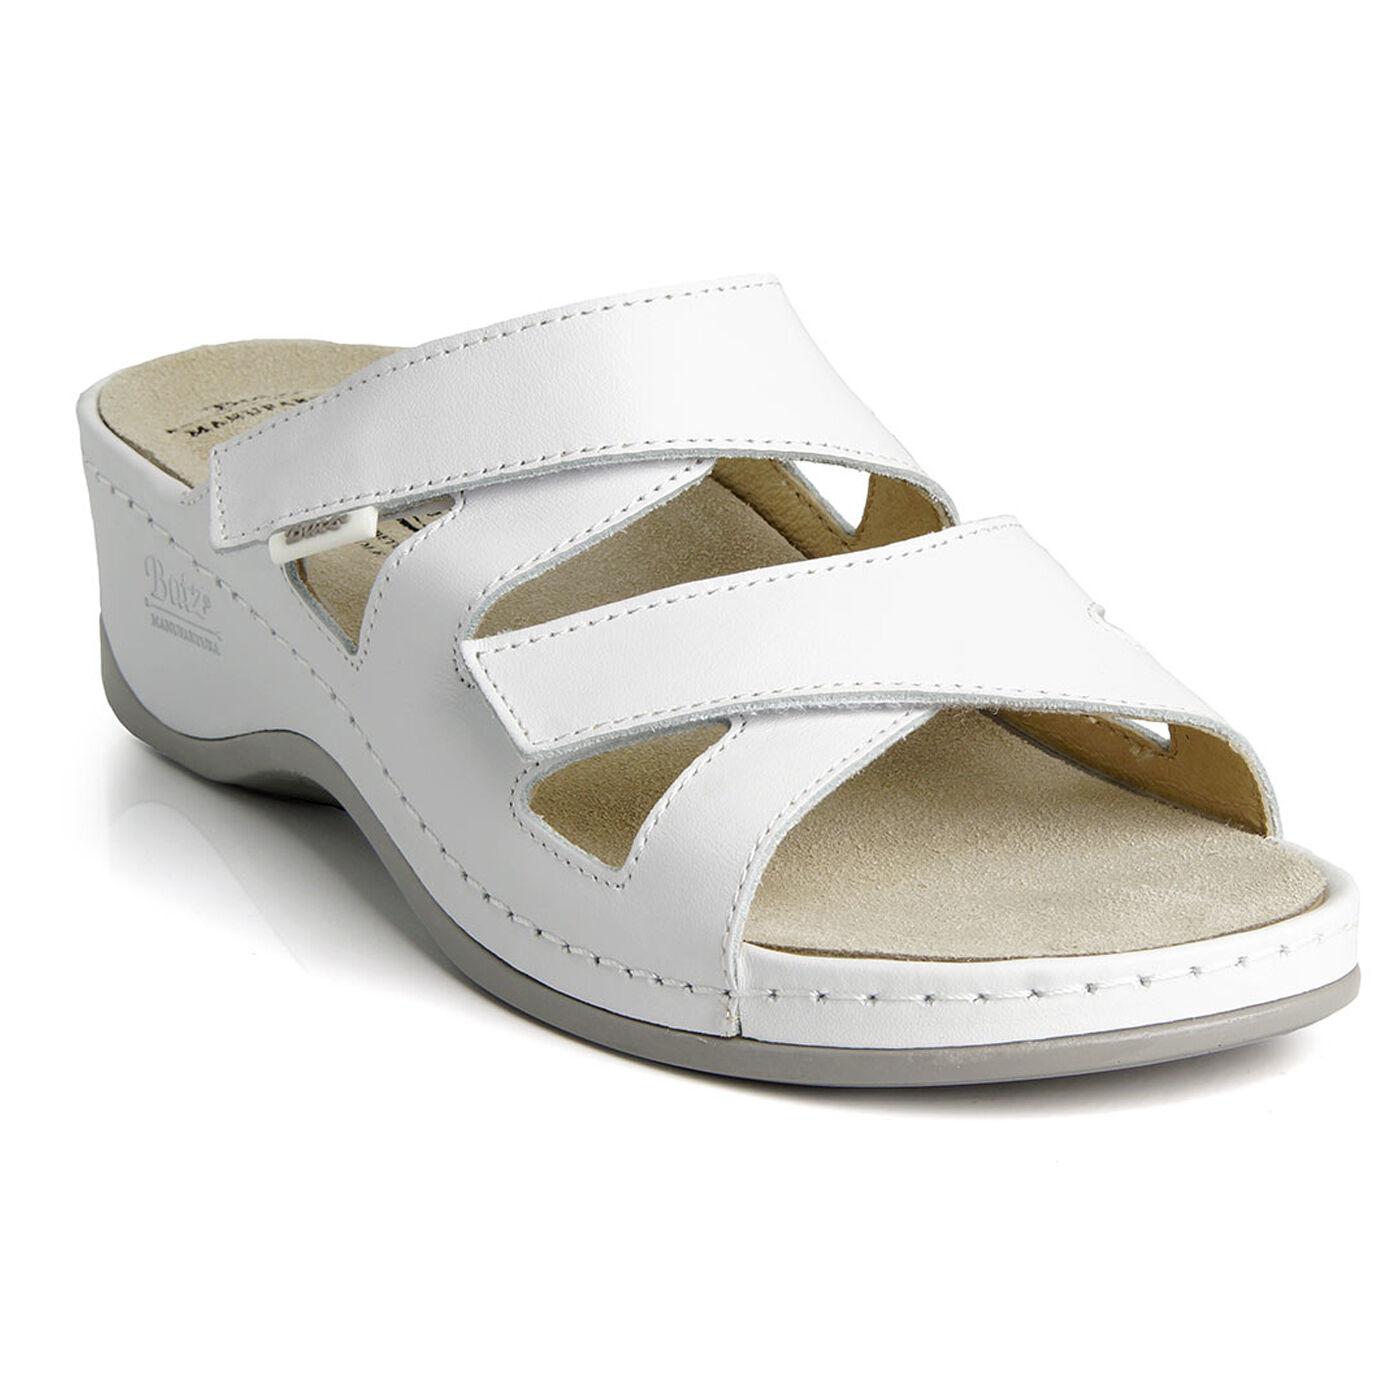 Batz EVELIN White Top Quality Handmade Leather Sandals Clogs Mules Women UK New